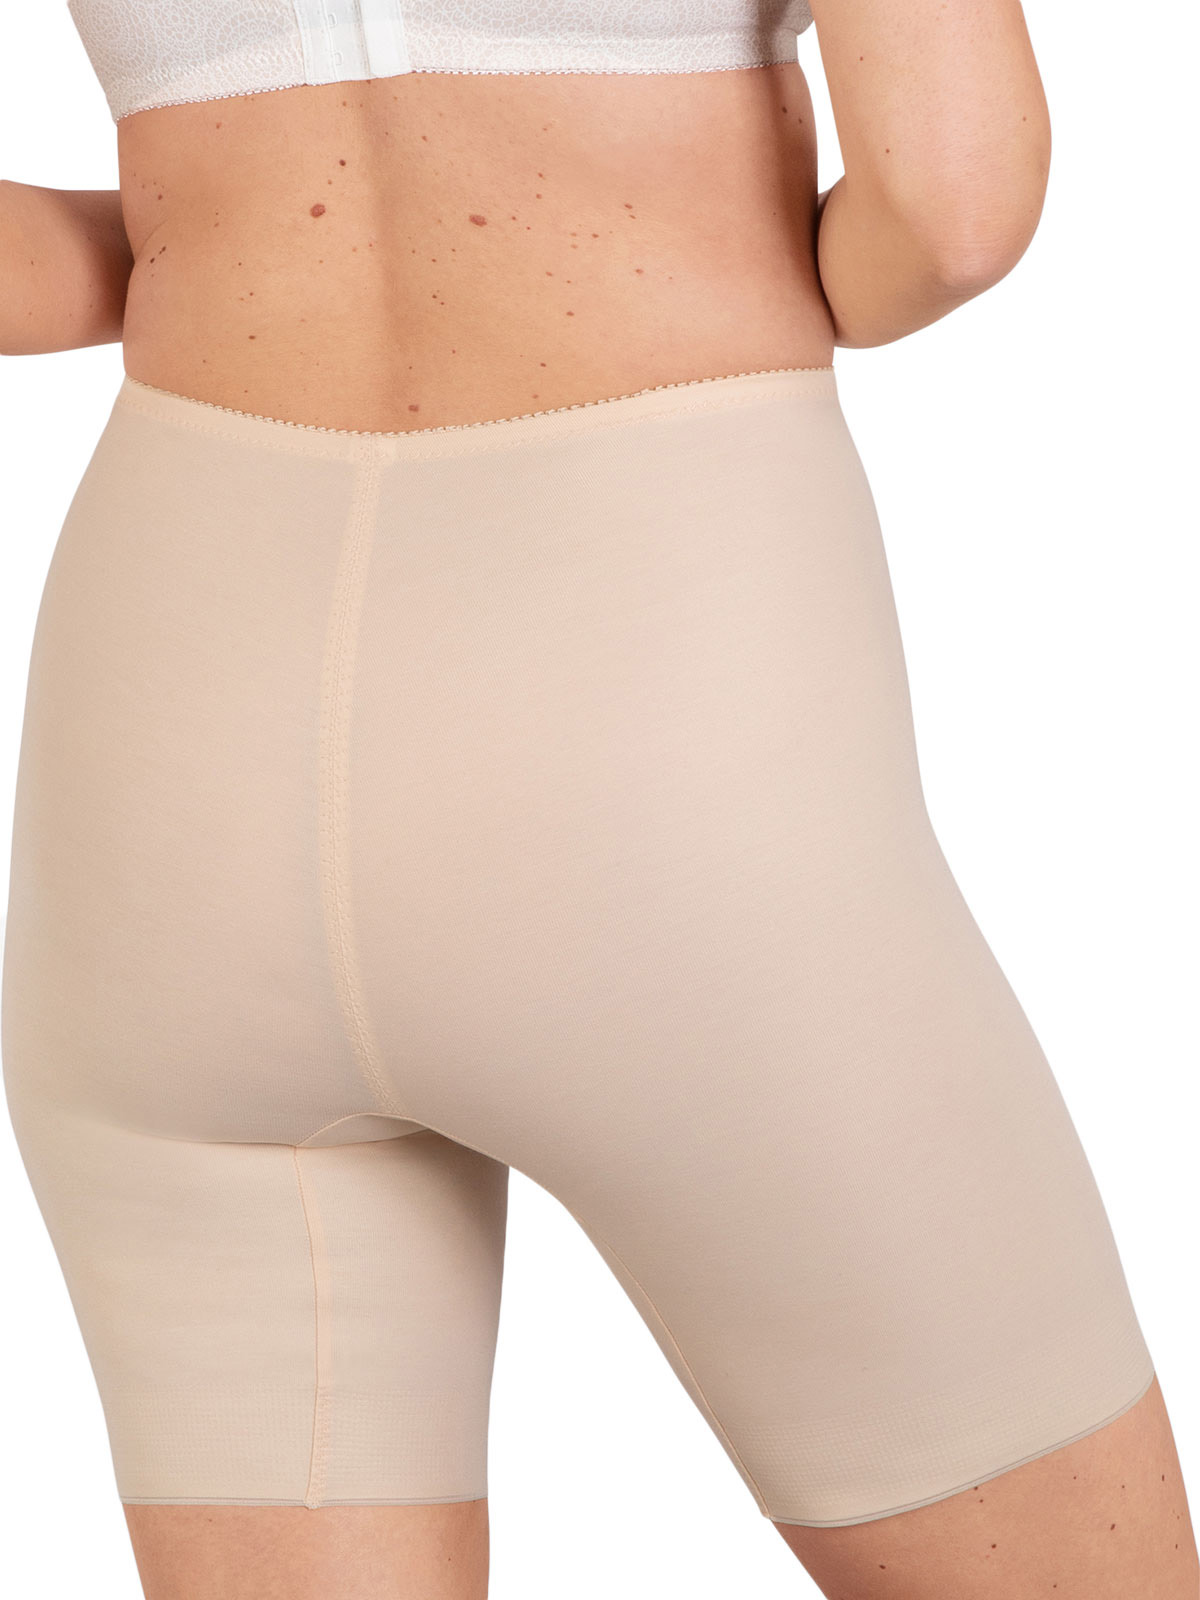 Naturana Long Leg Panty Girdle 0418